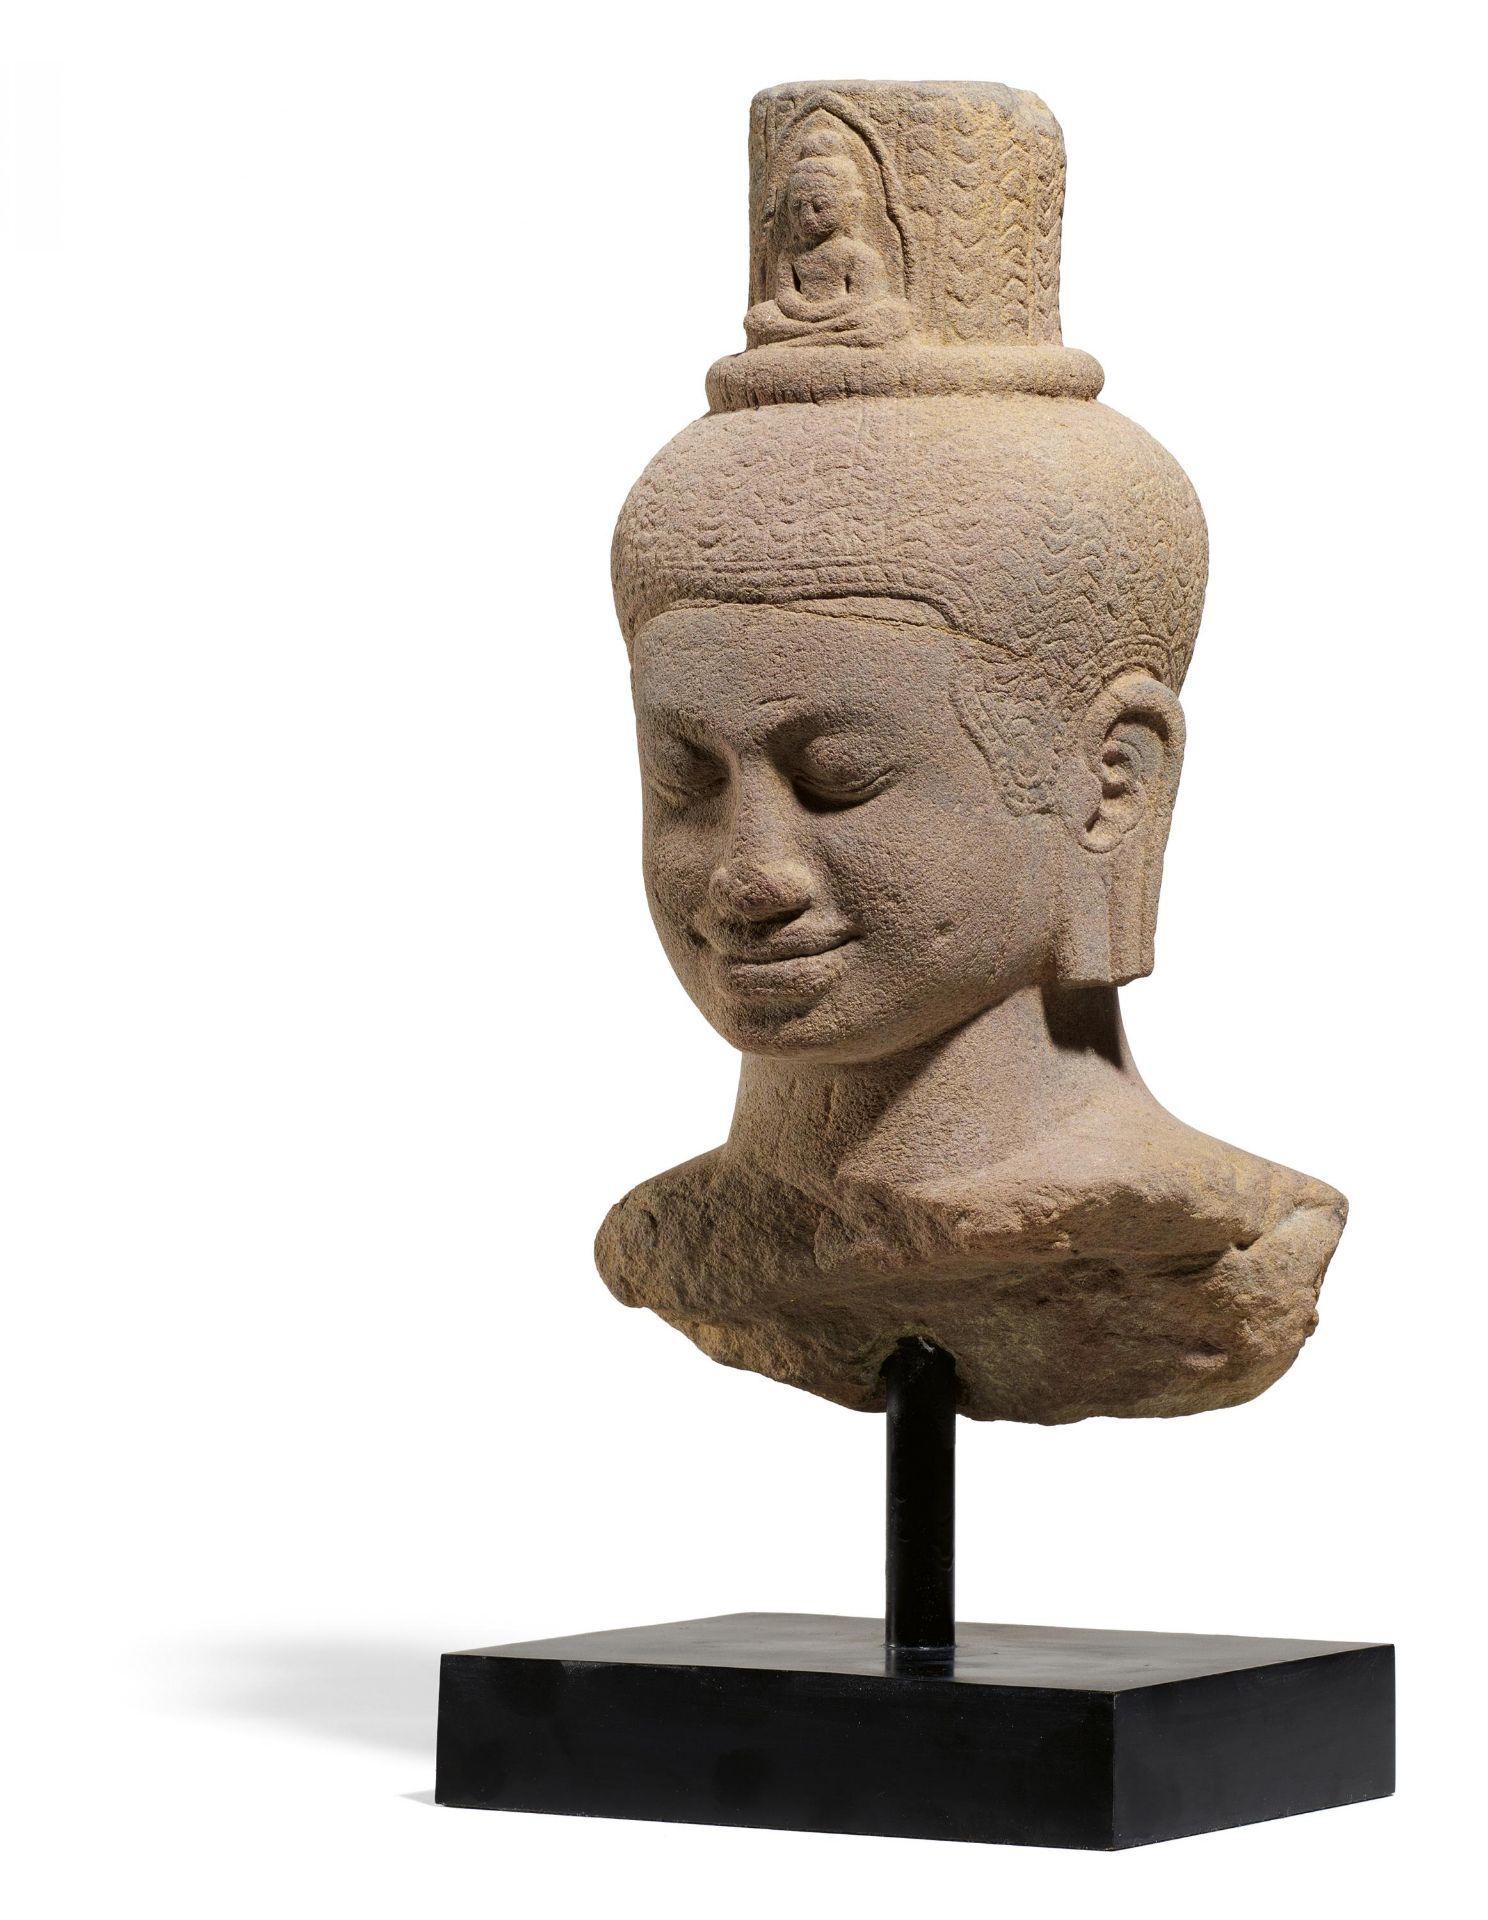 Los 56 - IMPORTANT BUST OF THE BODHISATTVA AVALOKITESHVARA. Origin: Khmer. Date: Late 12th c. Technique: